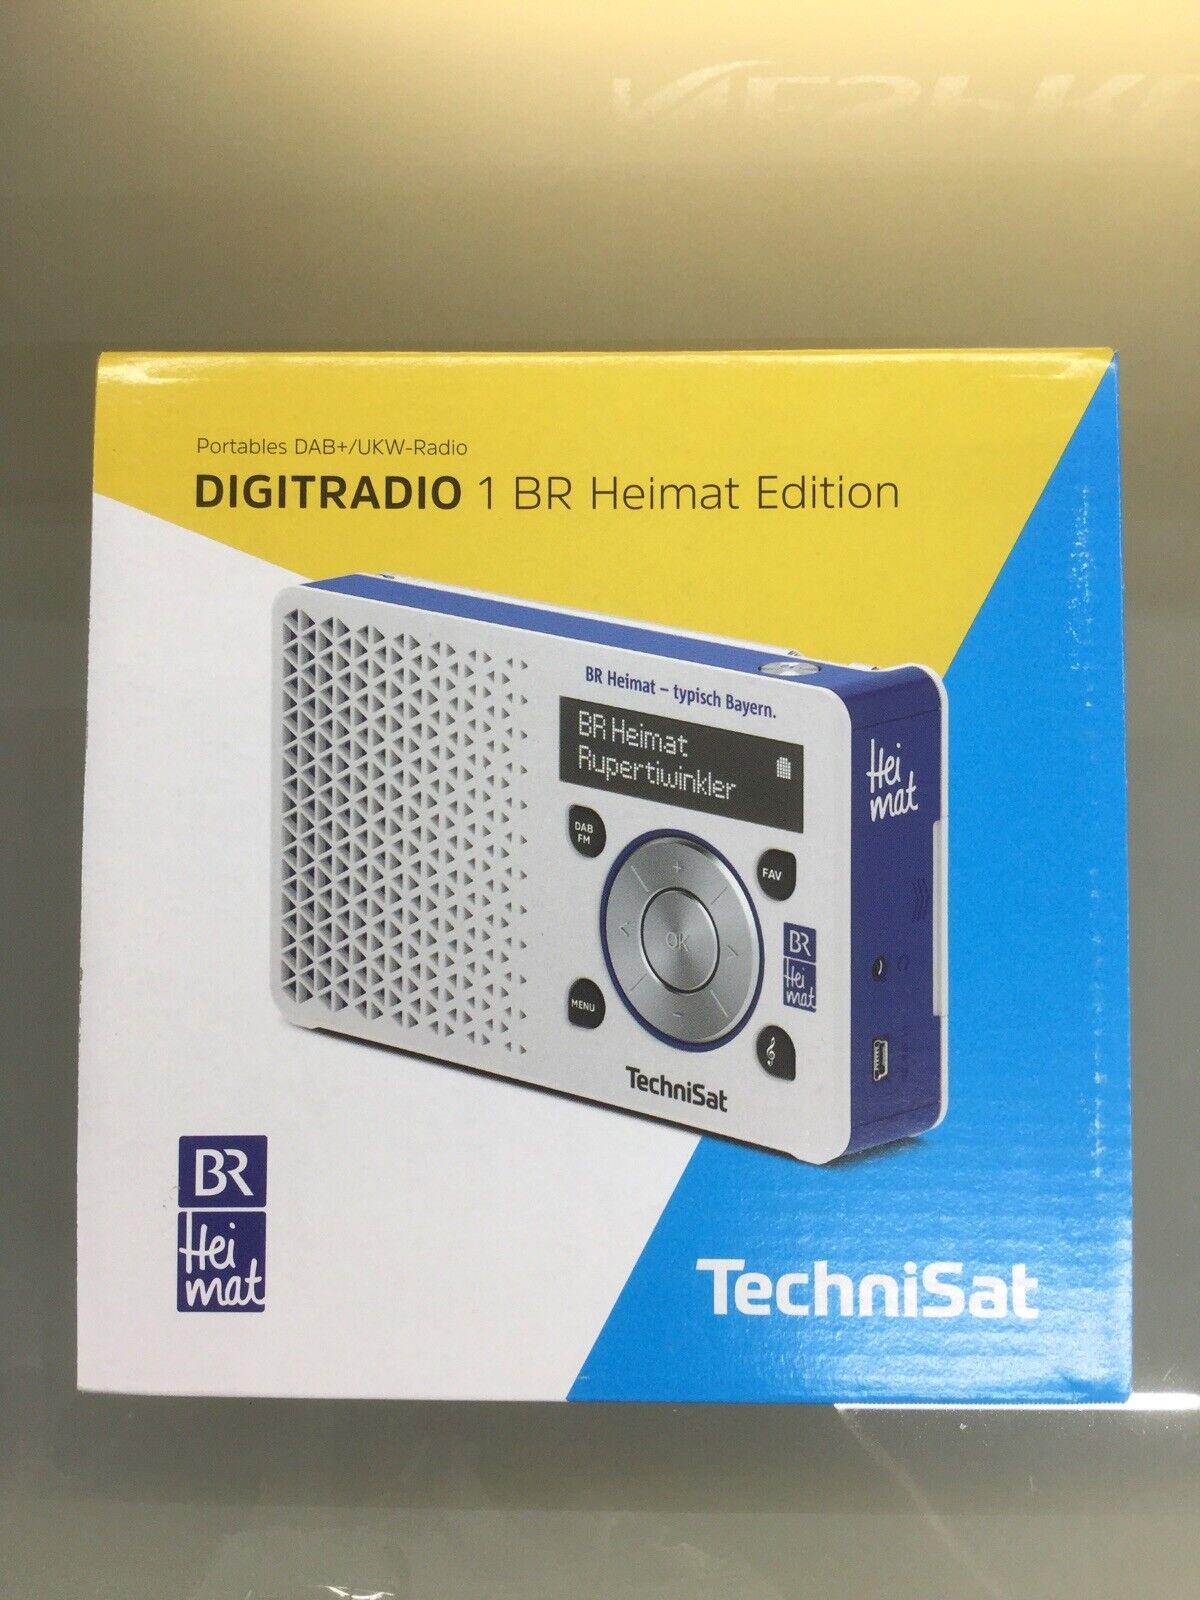 Technisat Digitradio1brheimat Digitalradio Br Heimat Gunstig Kaufen Ebay